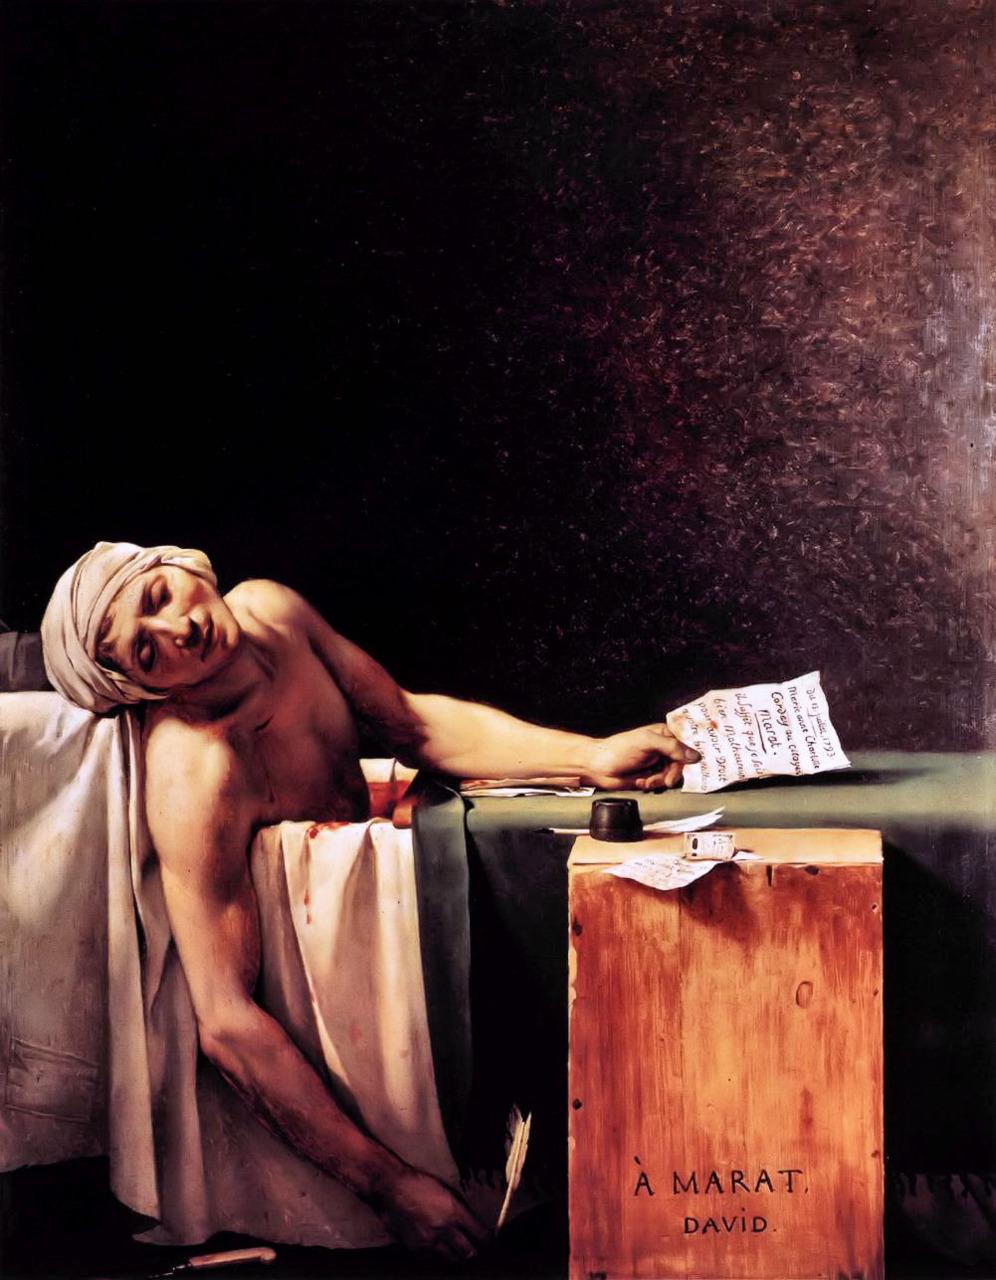 The Death of Maratby Jacques-Louis David